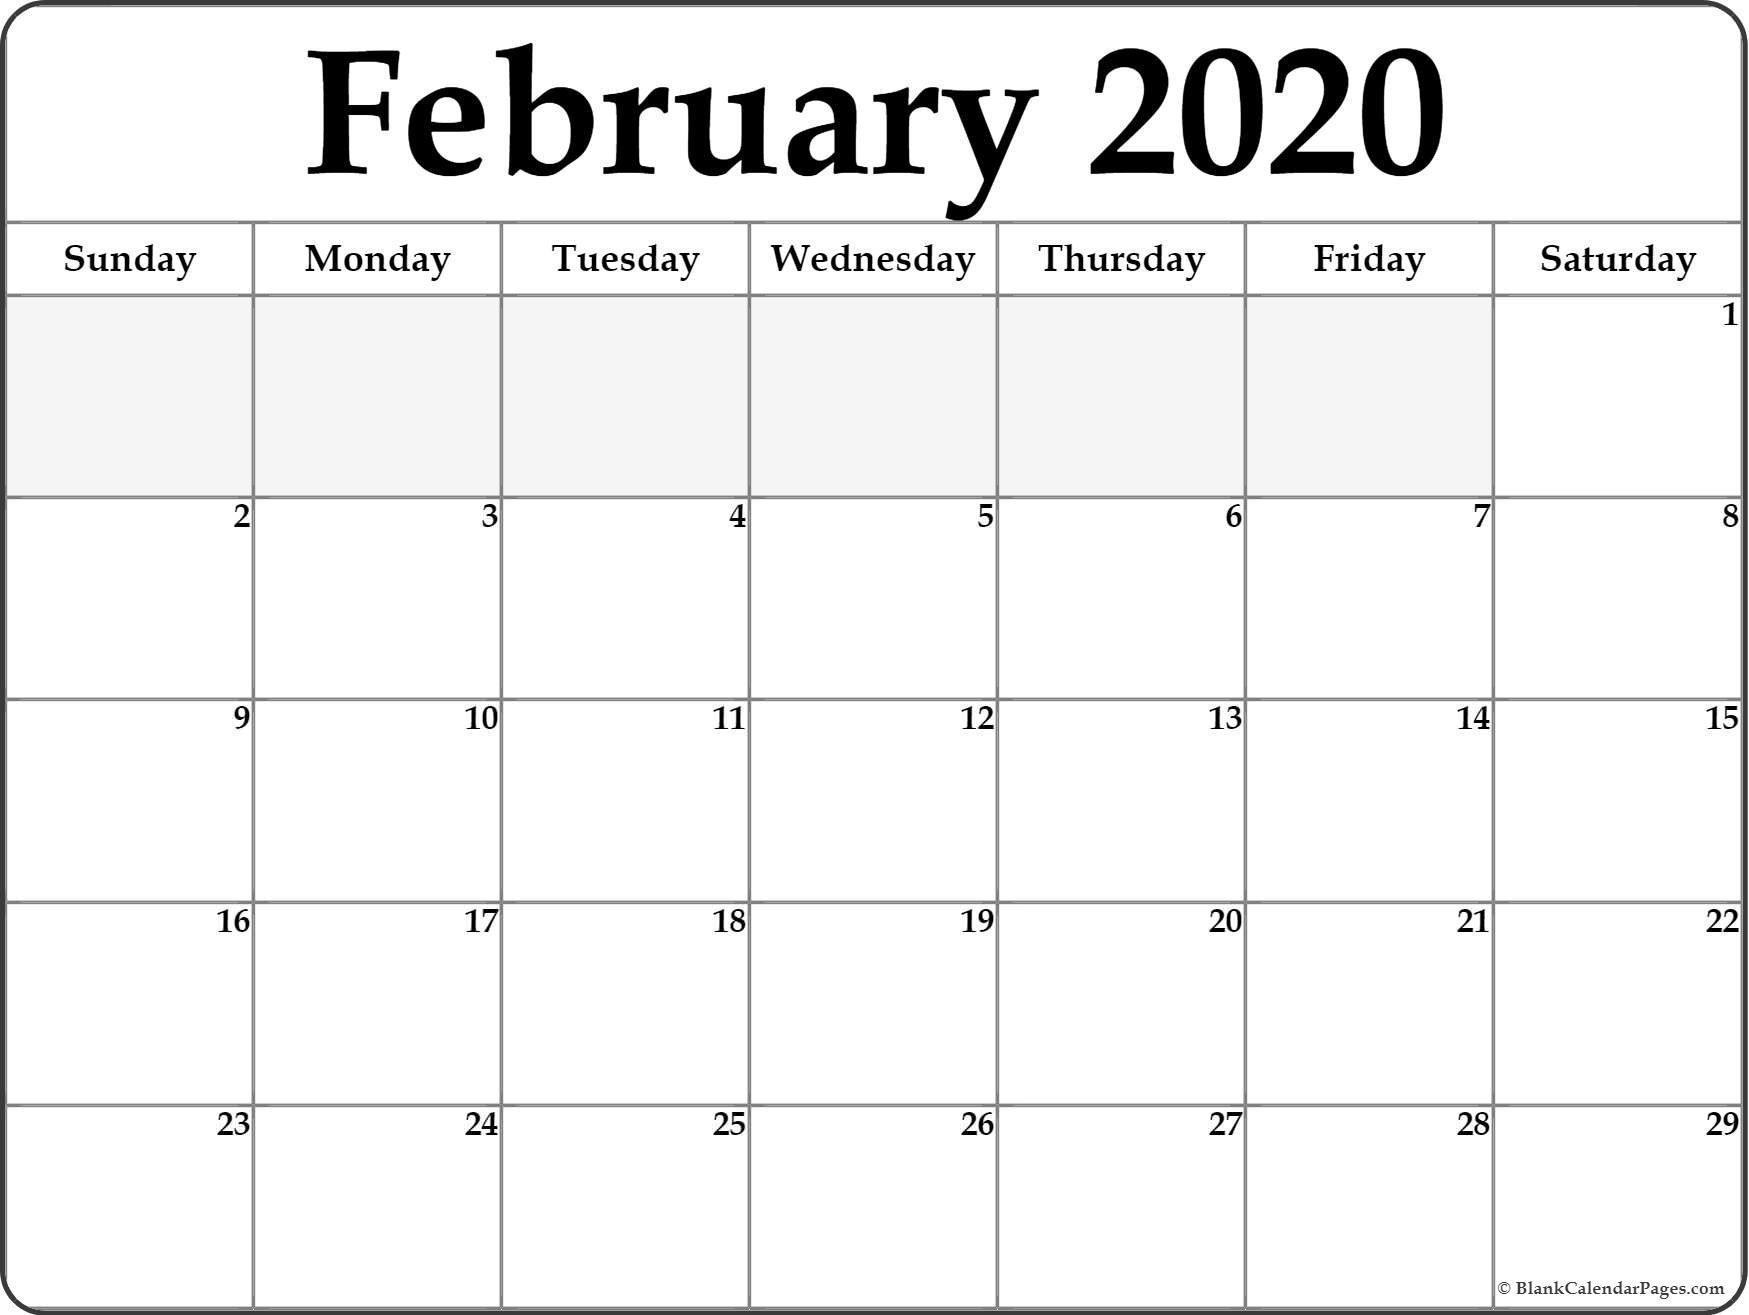 February 2020 Calendar | Free Printable Monthly Calendars Free Blank Calendar Page